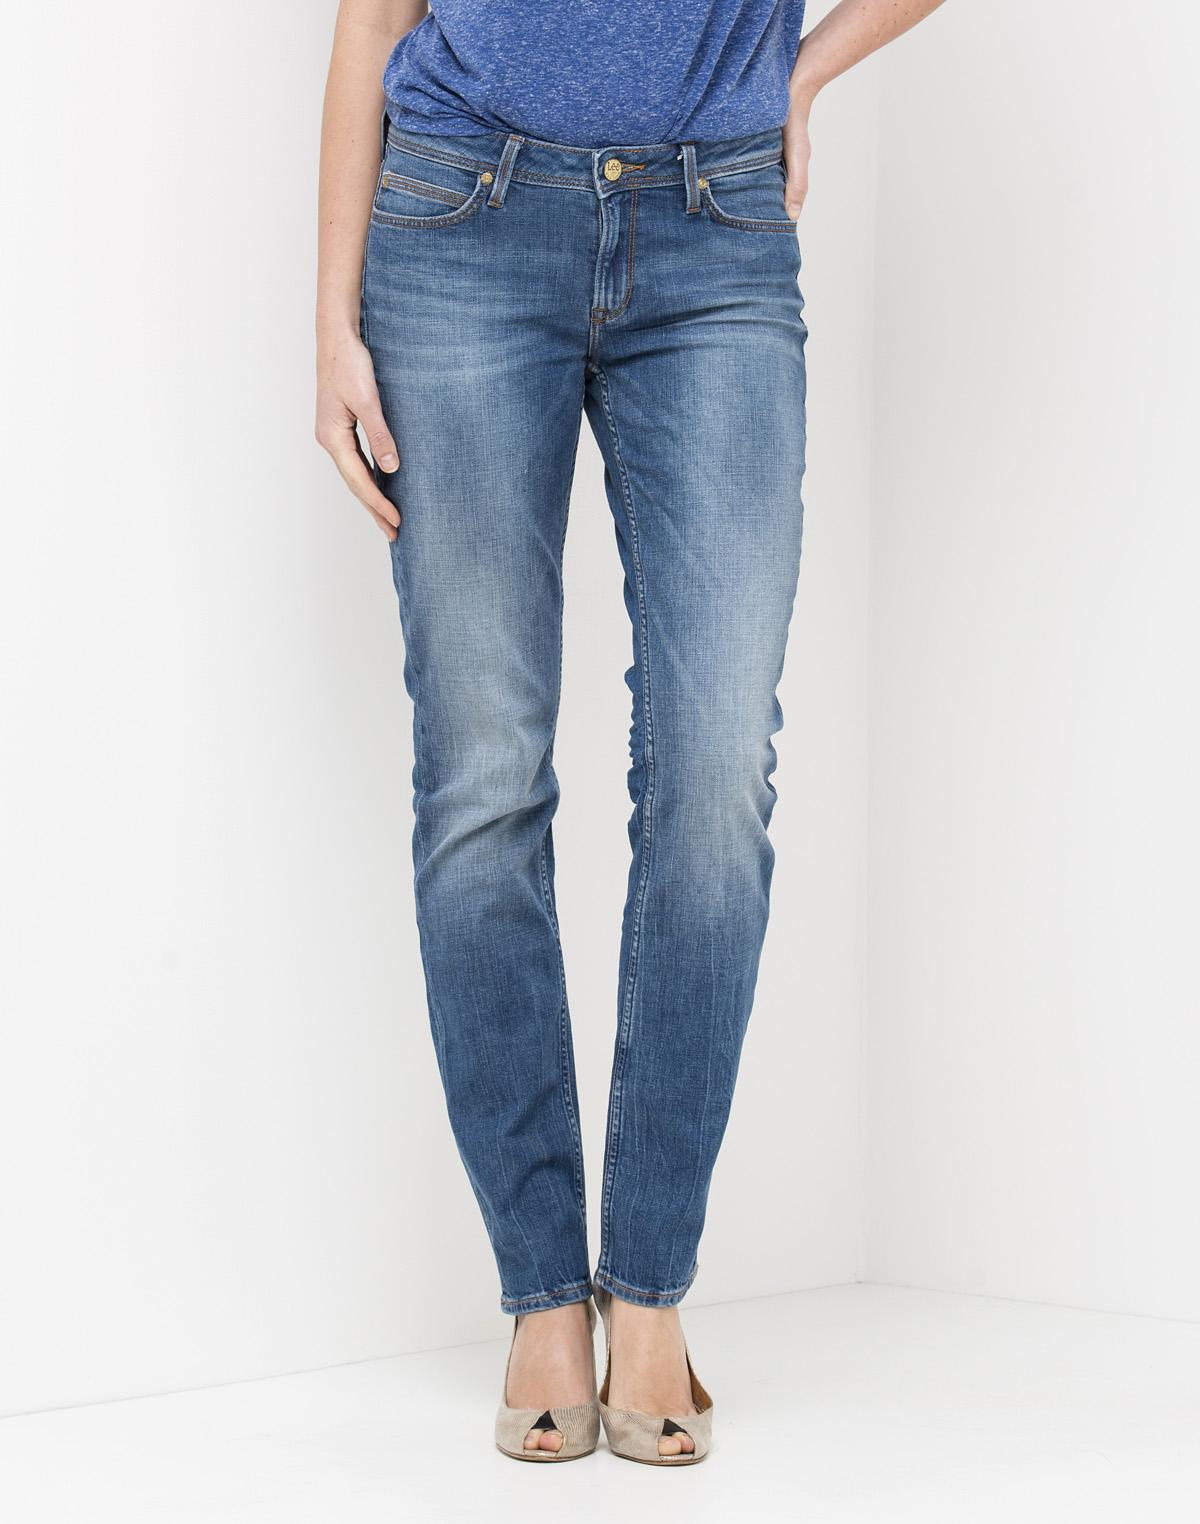 LEE dámské kalhoty (jeans) Emlyn Regular Slim L370BCQD Modrá W28/L31